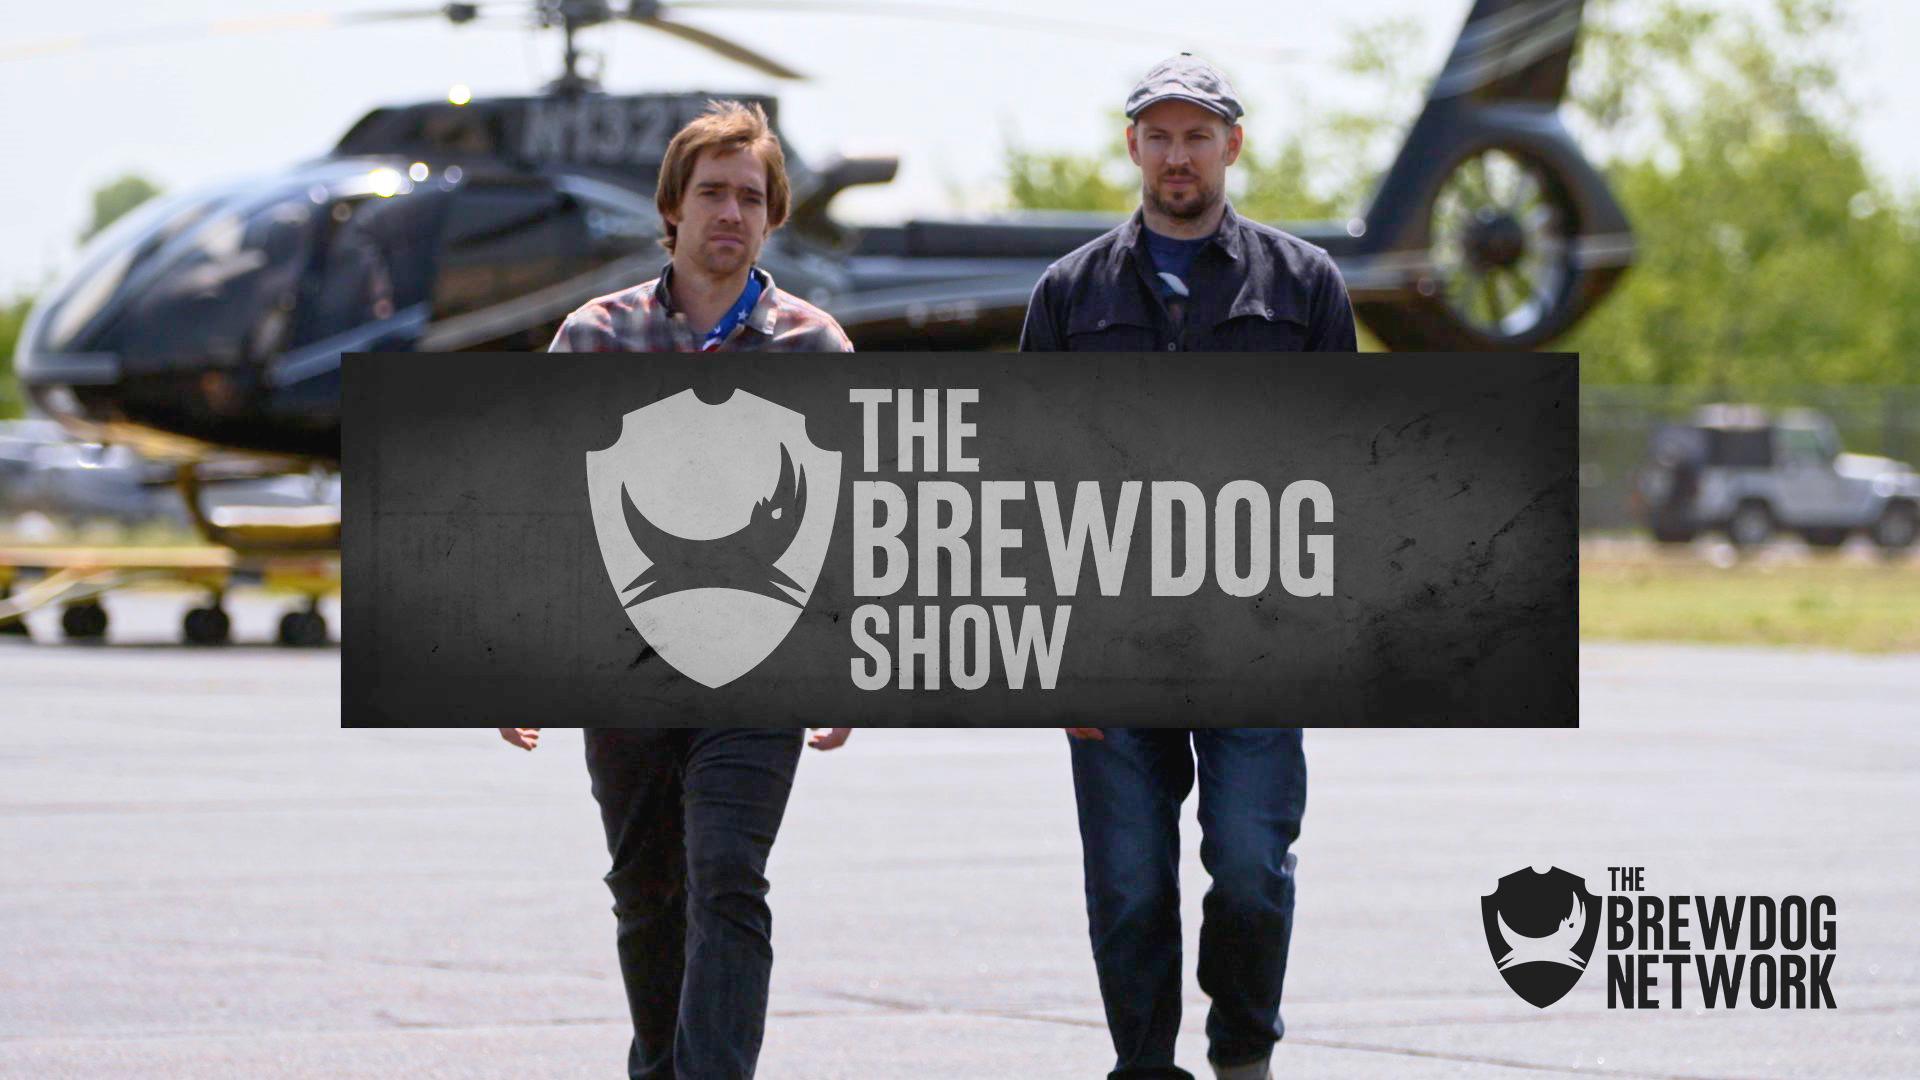 TheBrewDogShow-Thumb.jpg